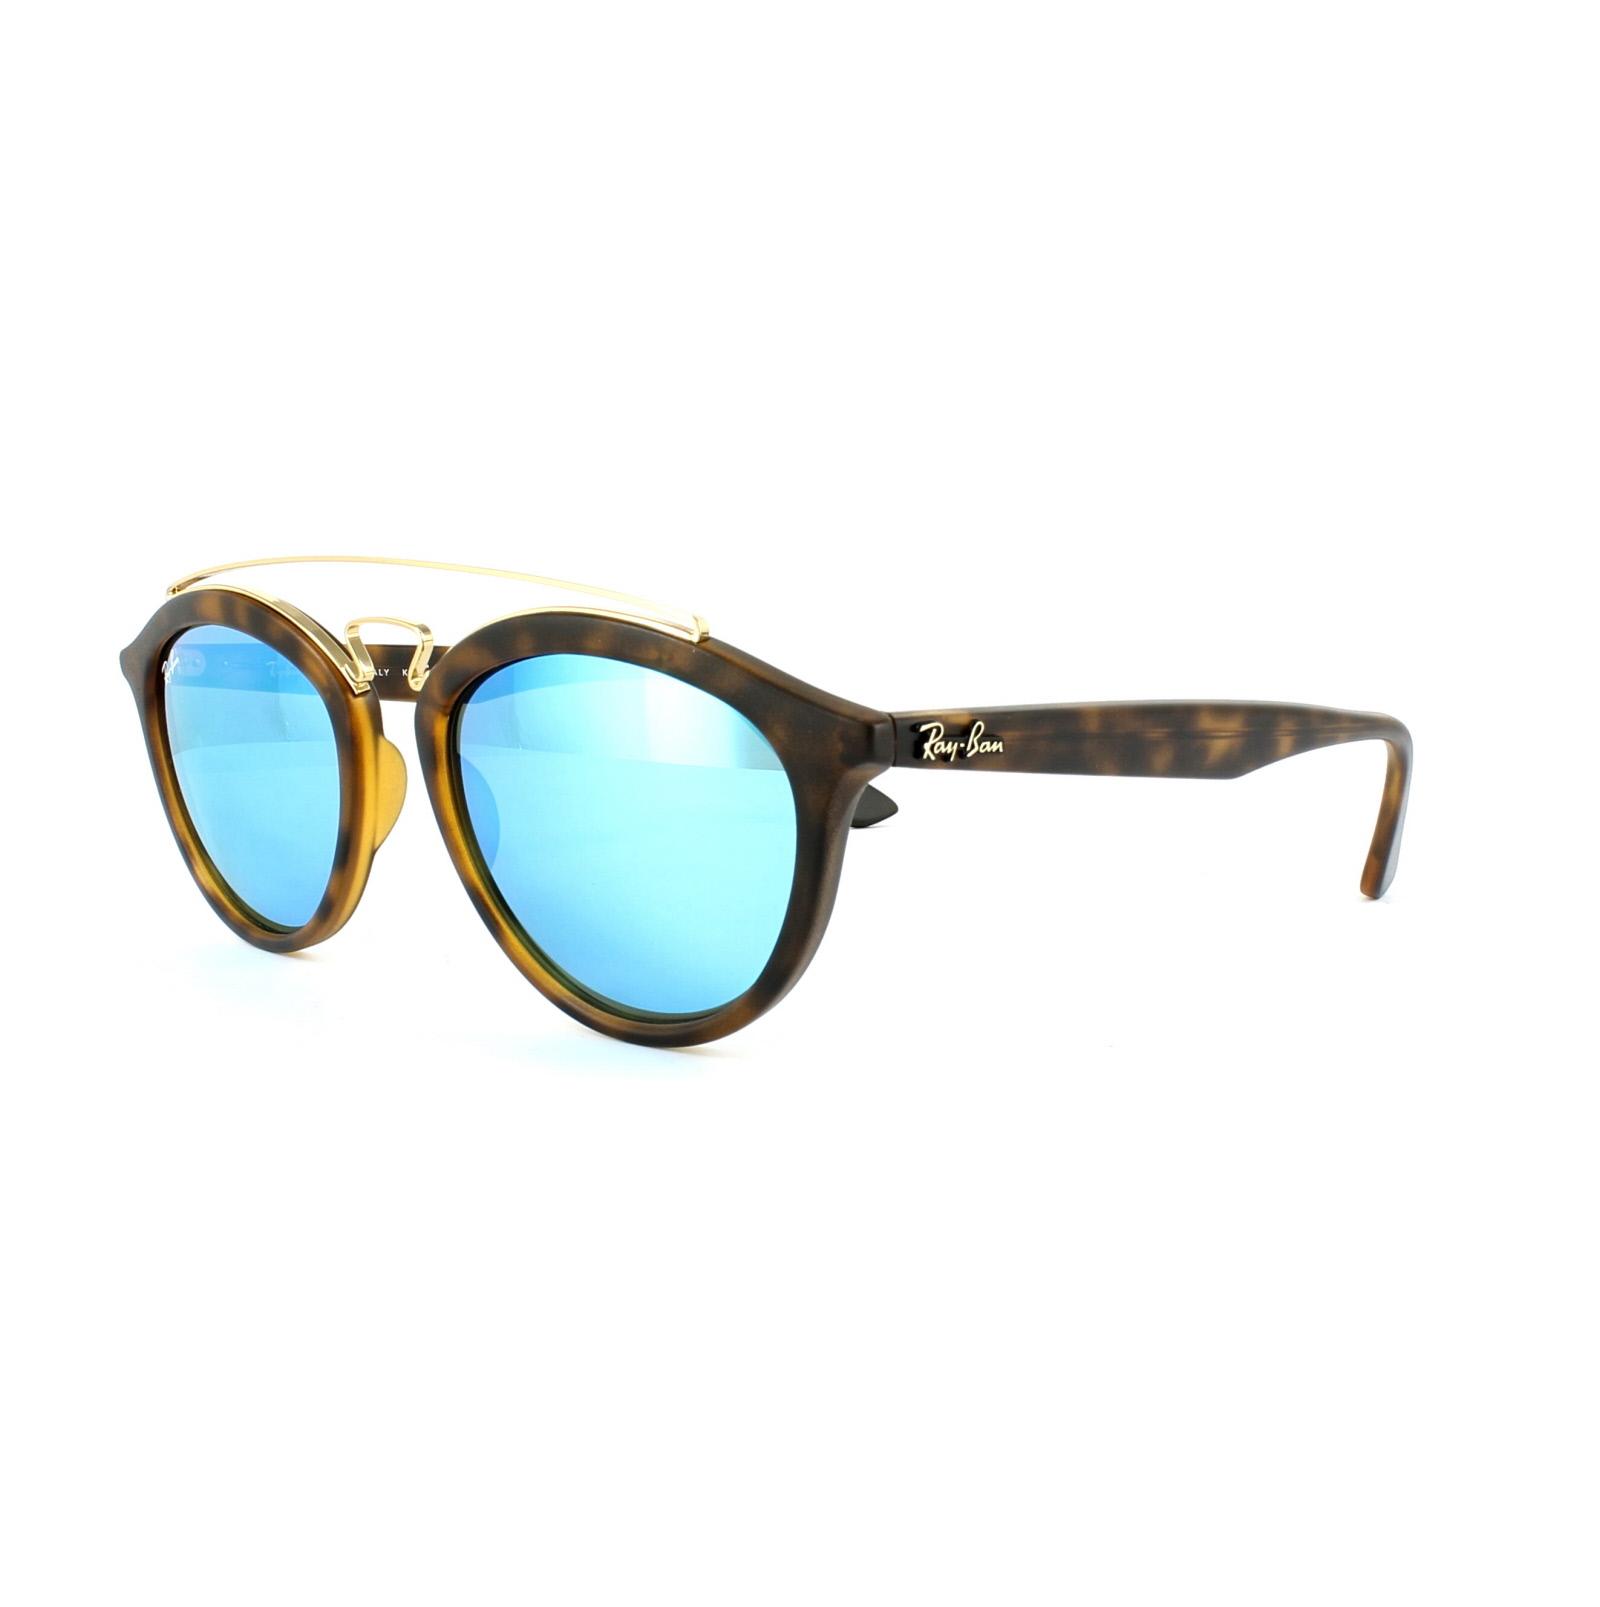 cf2a791ed47 Cheap Ray-Ban New Gatsby 4257 Sunglasses - Discounted Sunglasses